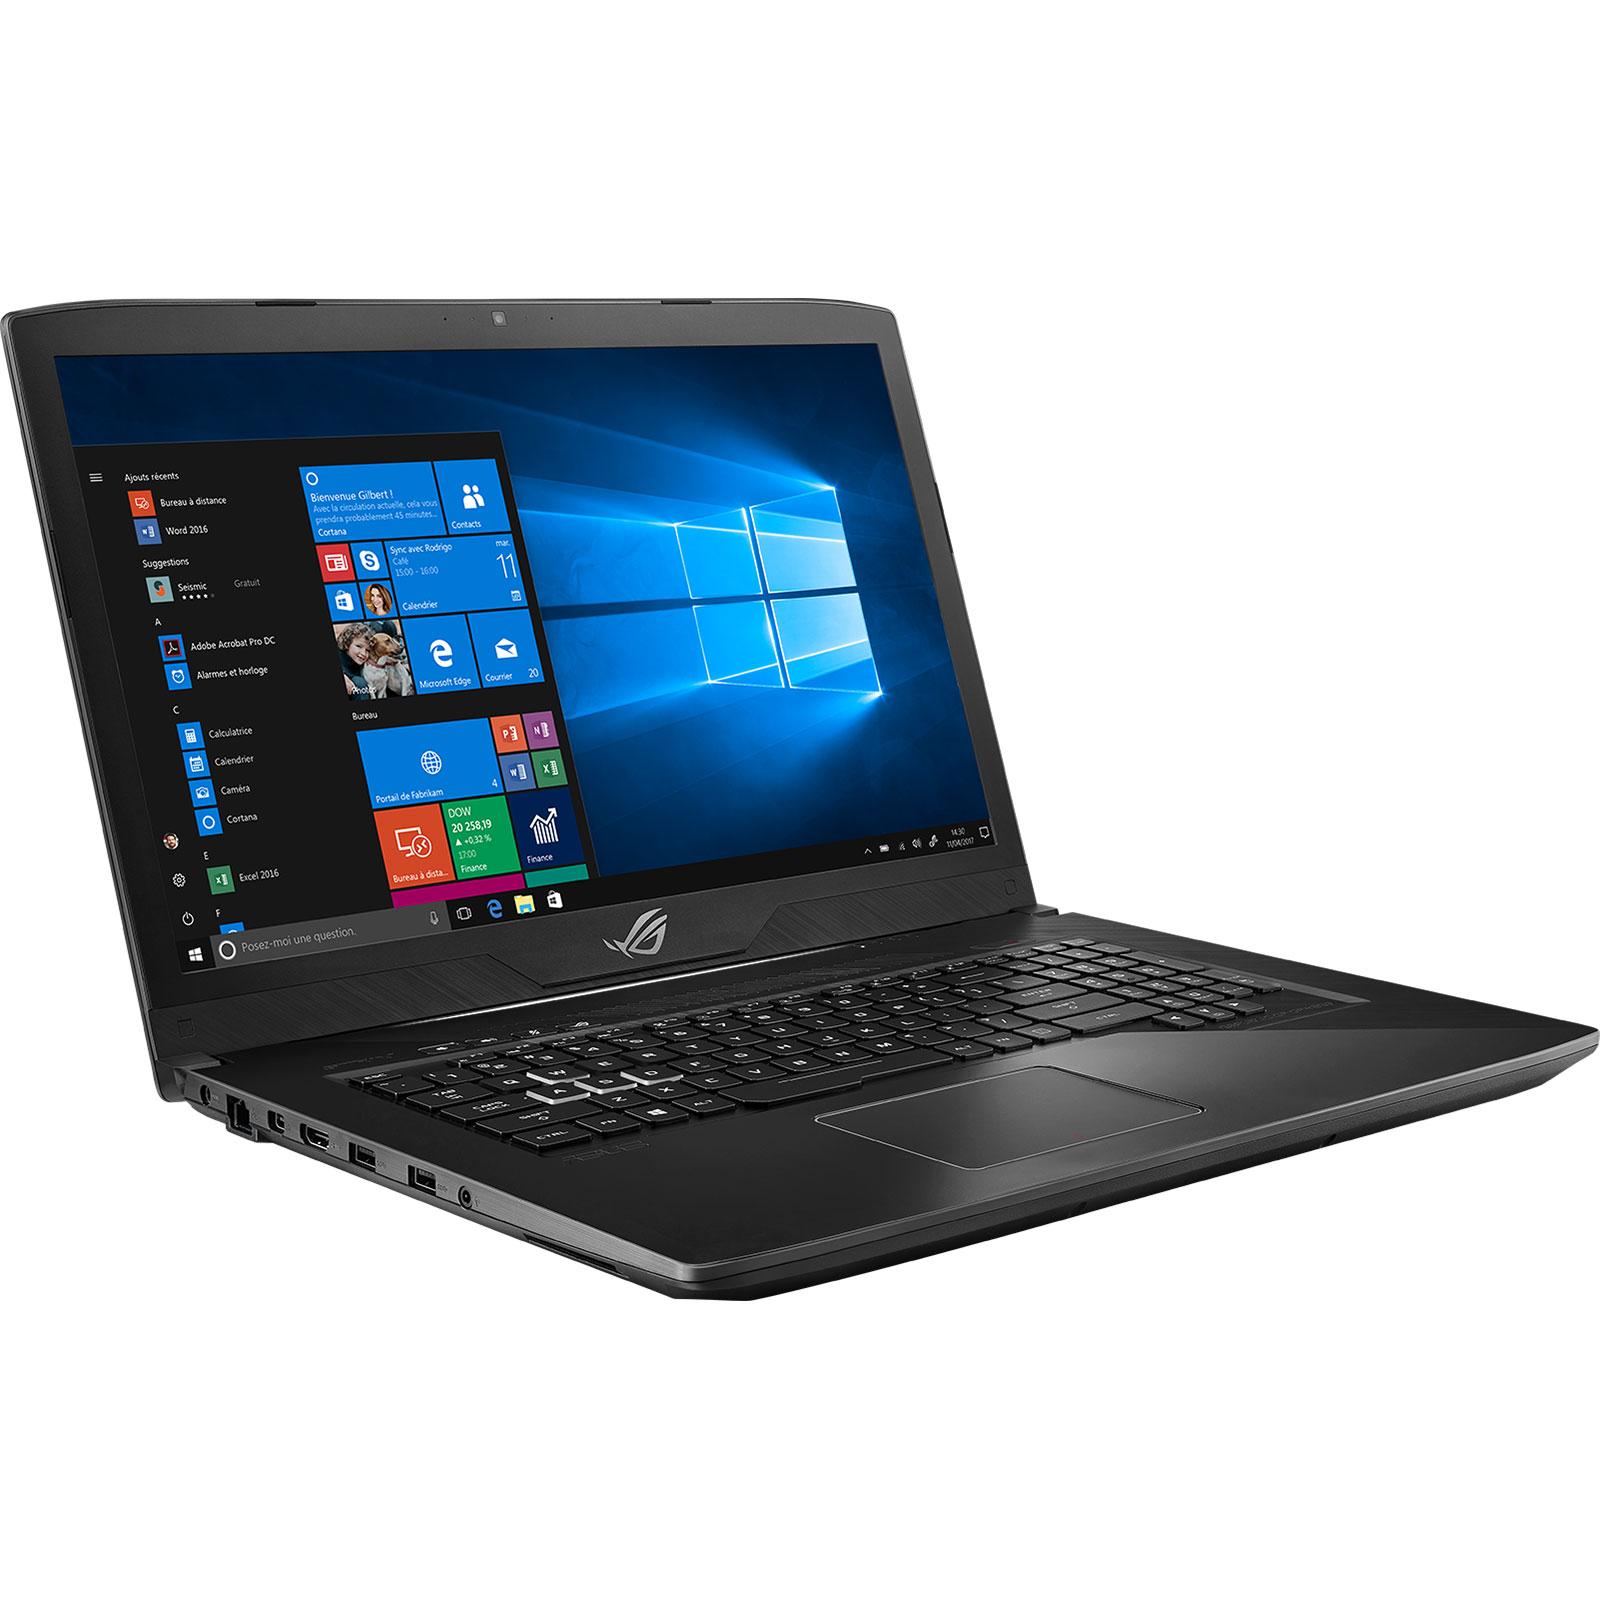 "PC portable ASUS ROG Station 17 PX703GE-GC153R Intel Core i7-8750H 32 Go SSD 256 Go + HDD 1 To 17.3"" LED Full HD NVIDIA GeForce GTX 1050 Ti 4 Go Wi-Fi AC/Bluetooth Webcam Windows 10 Professionnel 64 bits (garantie constructeur 2 ans)"